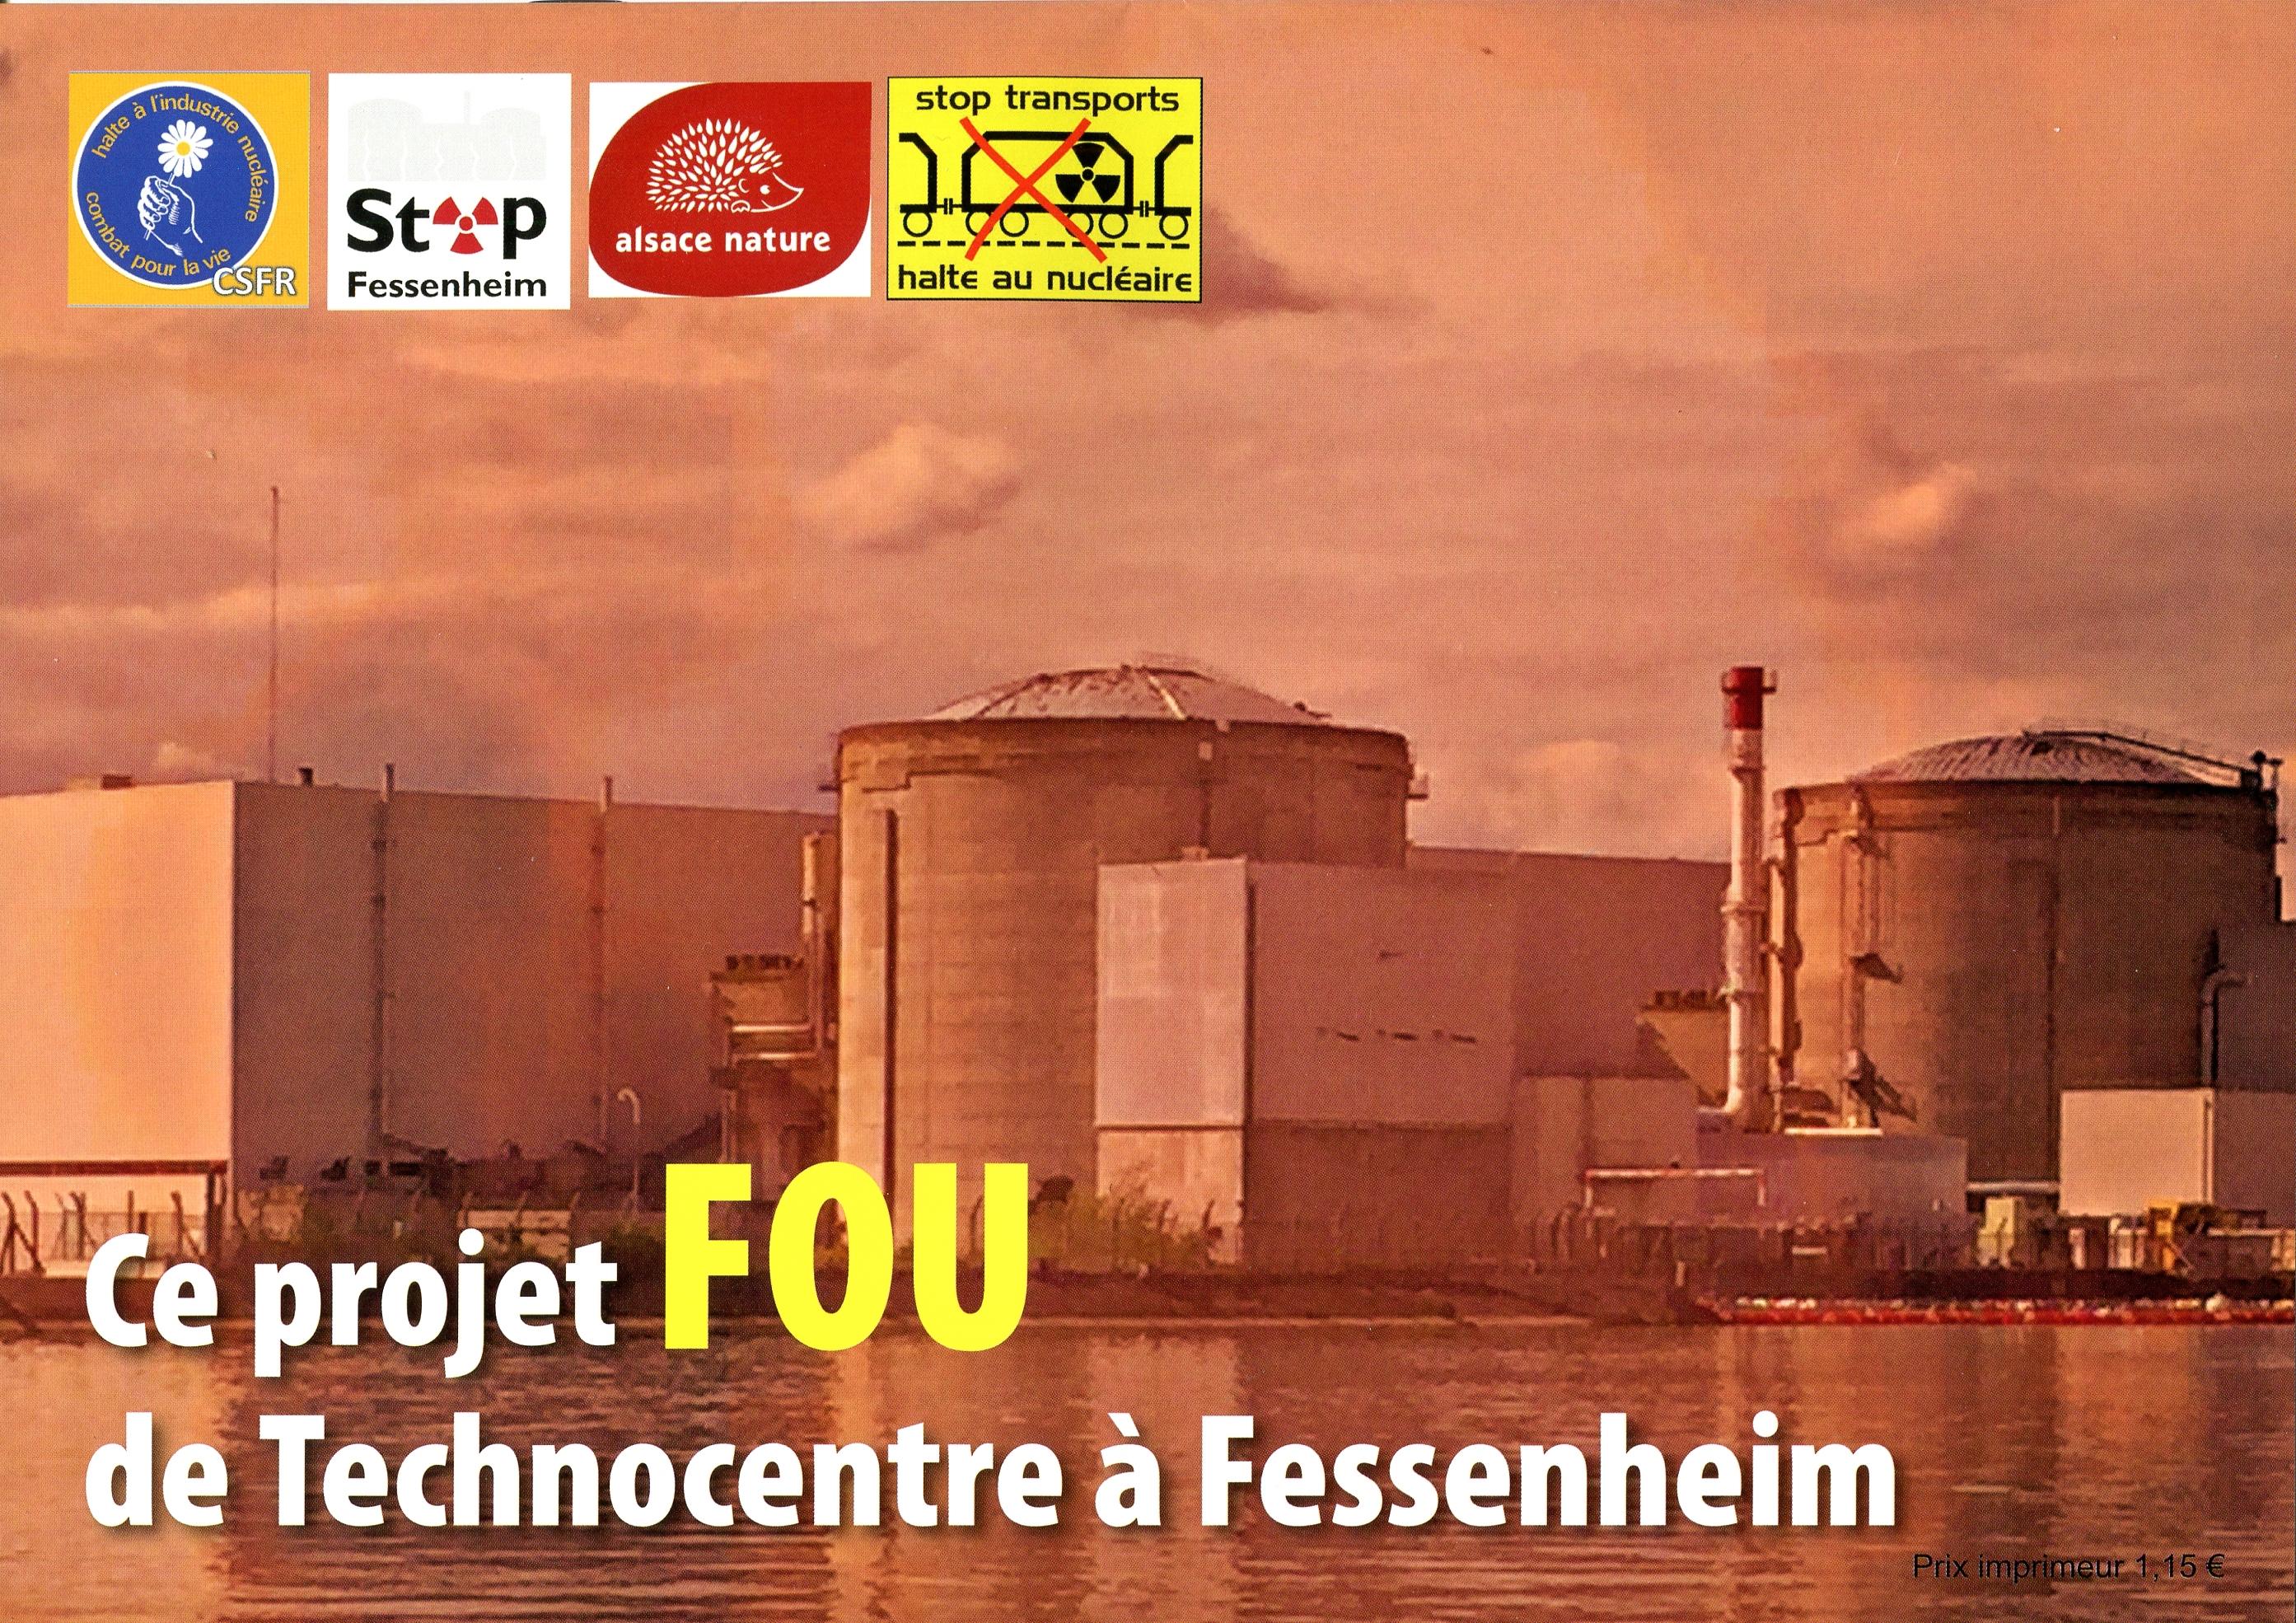 Ce projet FOU de Technocentre à Fessenheim